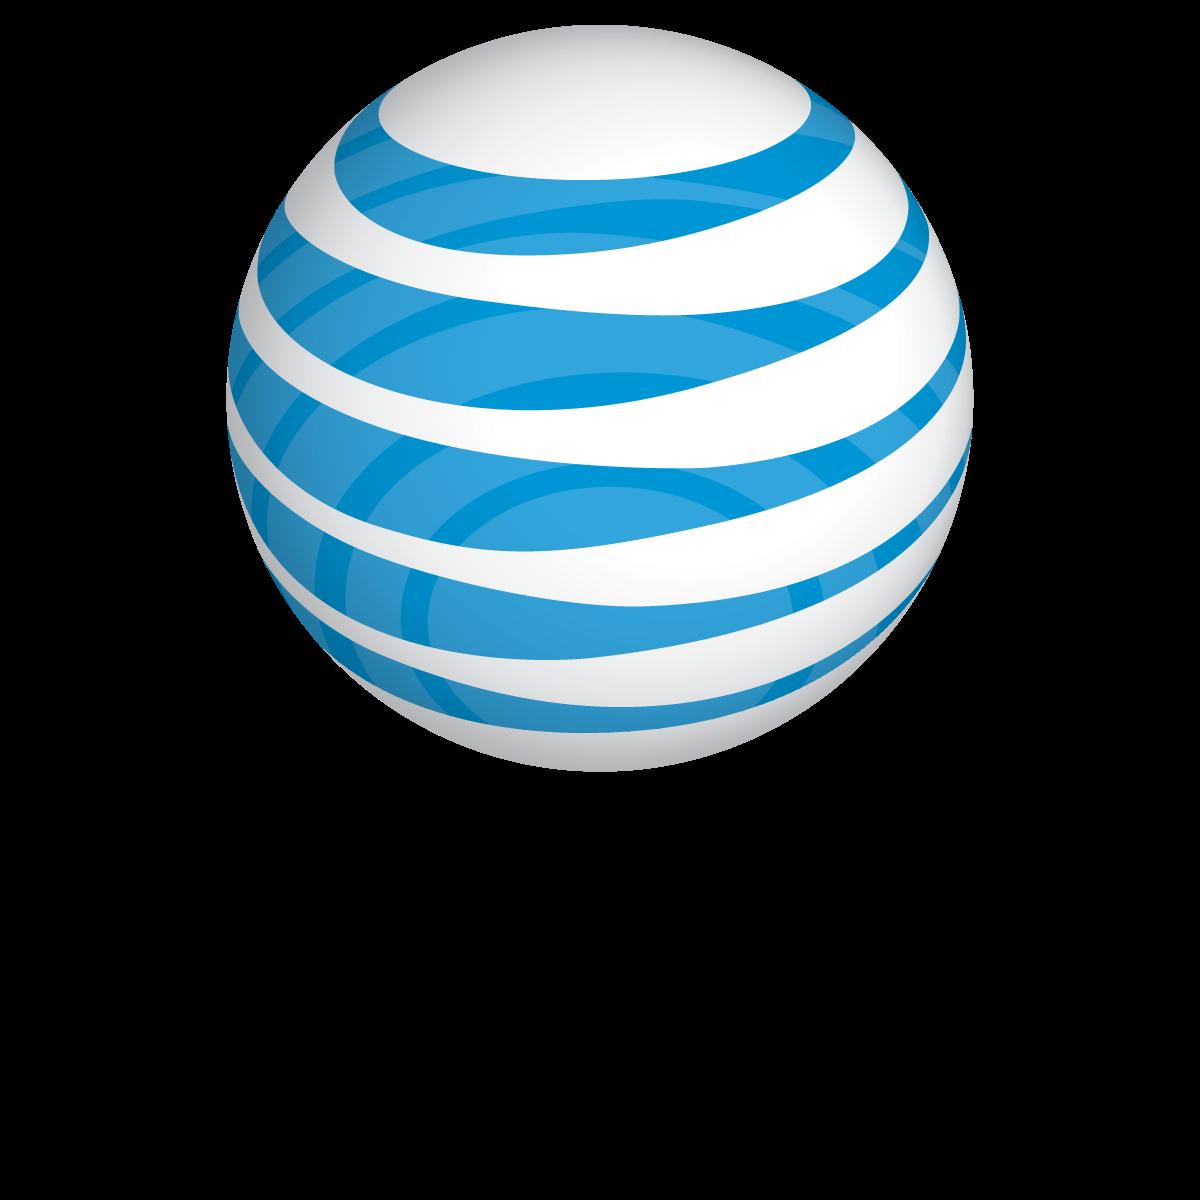 at-and-t-logo-vector.png